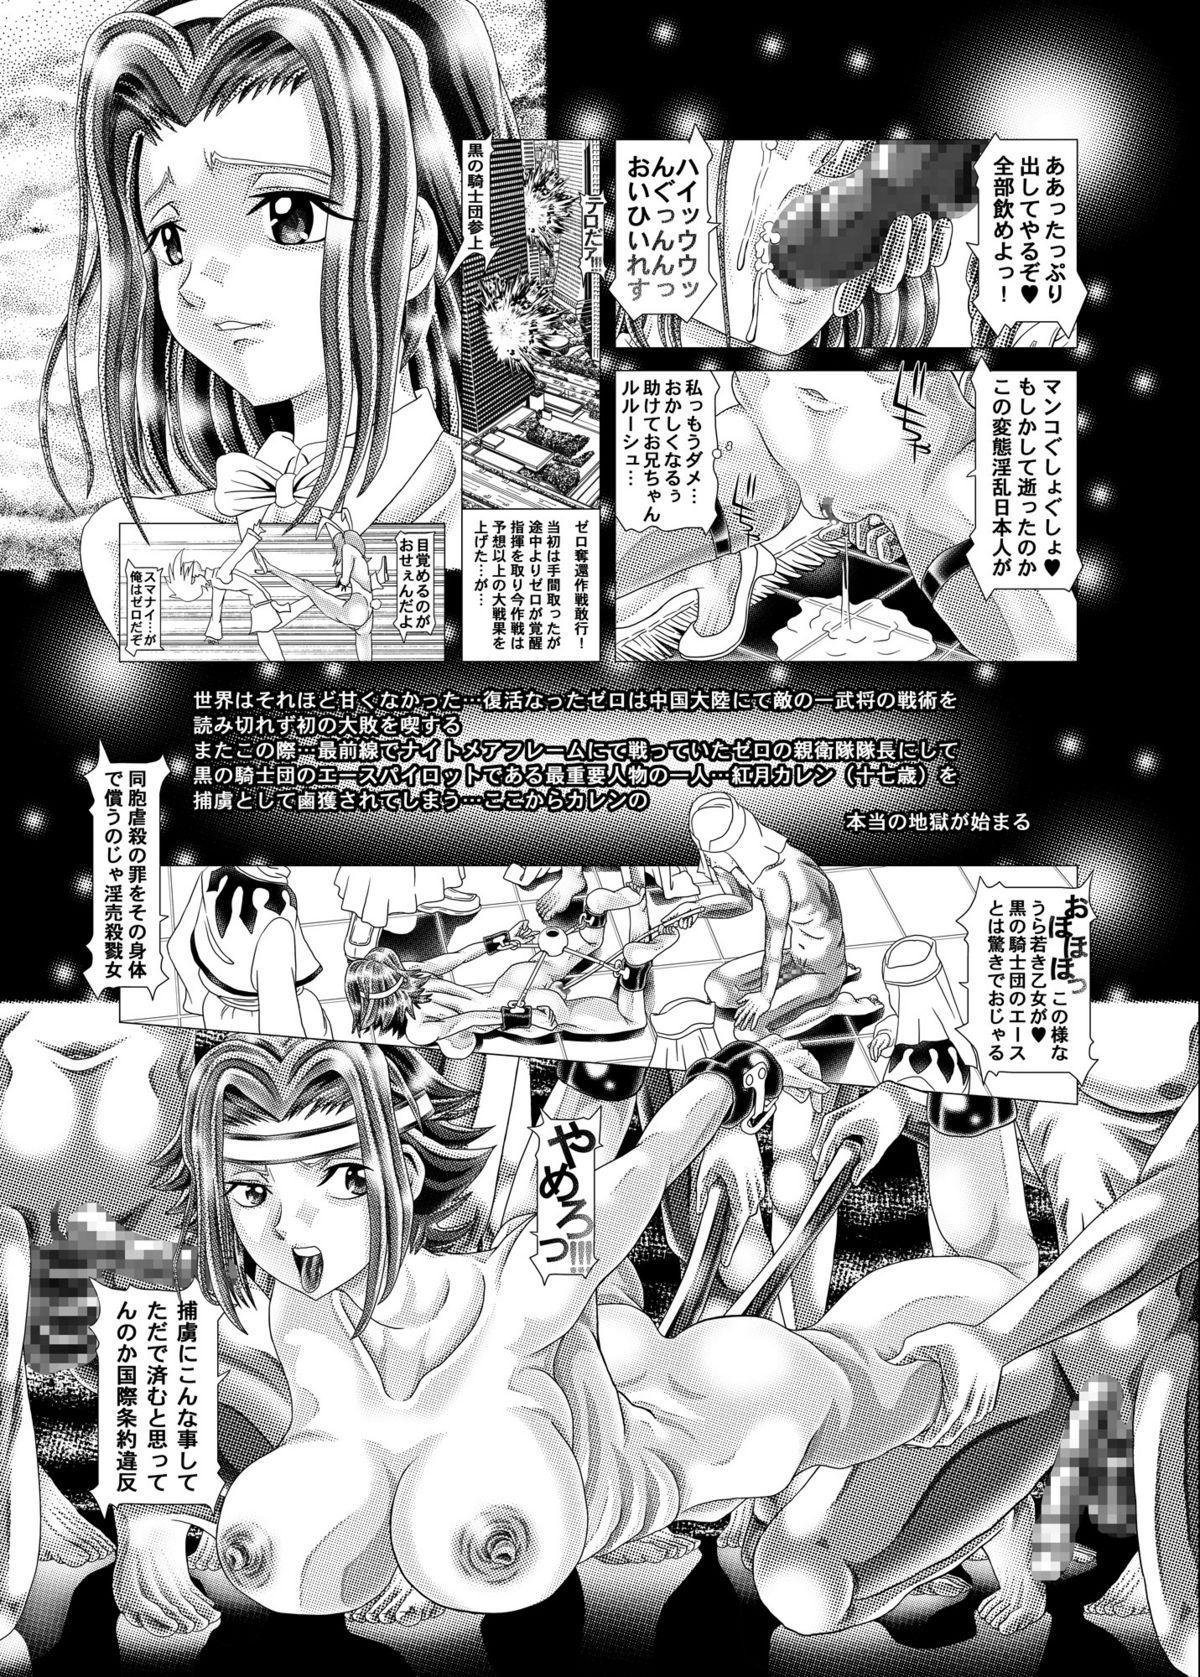 [Kaki no Boo (Kakinomoto Utamaro)] Karen - R22 of the Cord Eros - Infringement (Code Geass) [Digital] 6